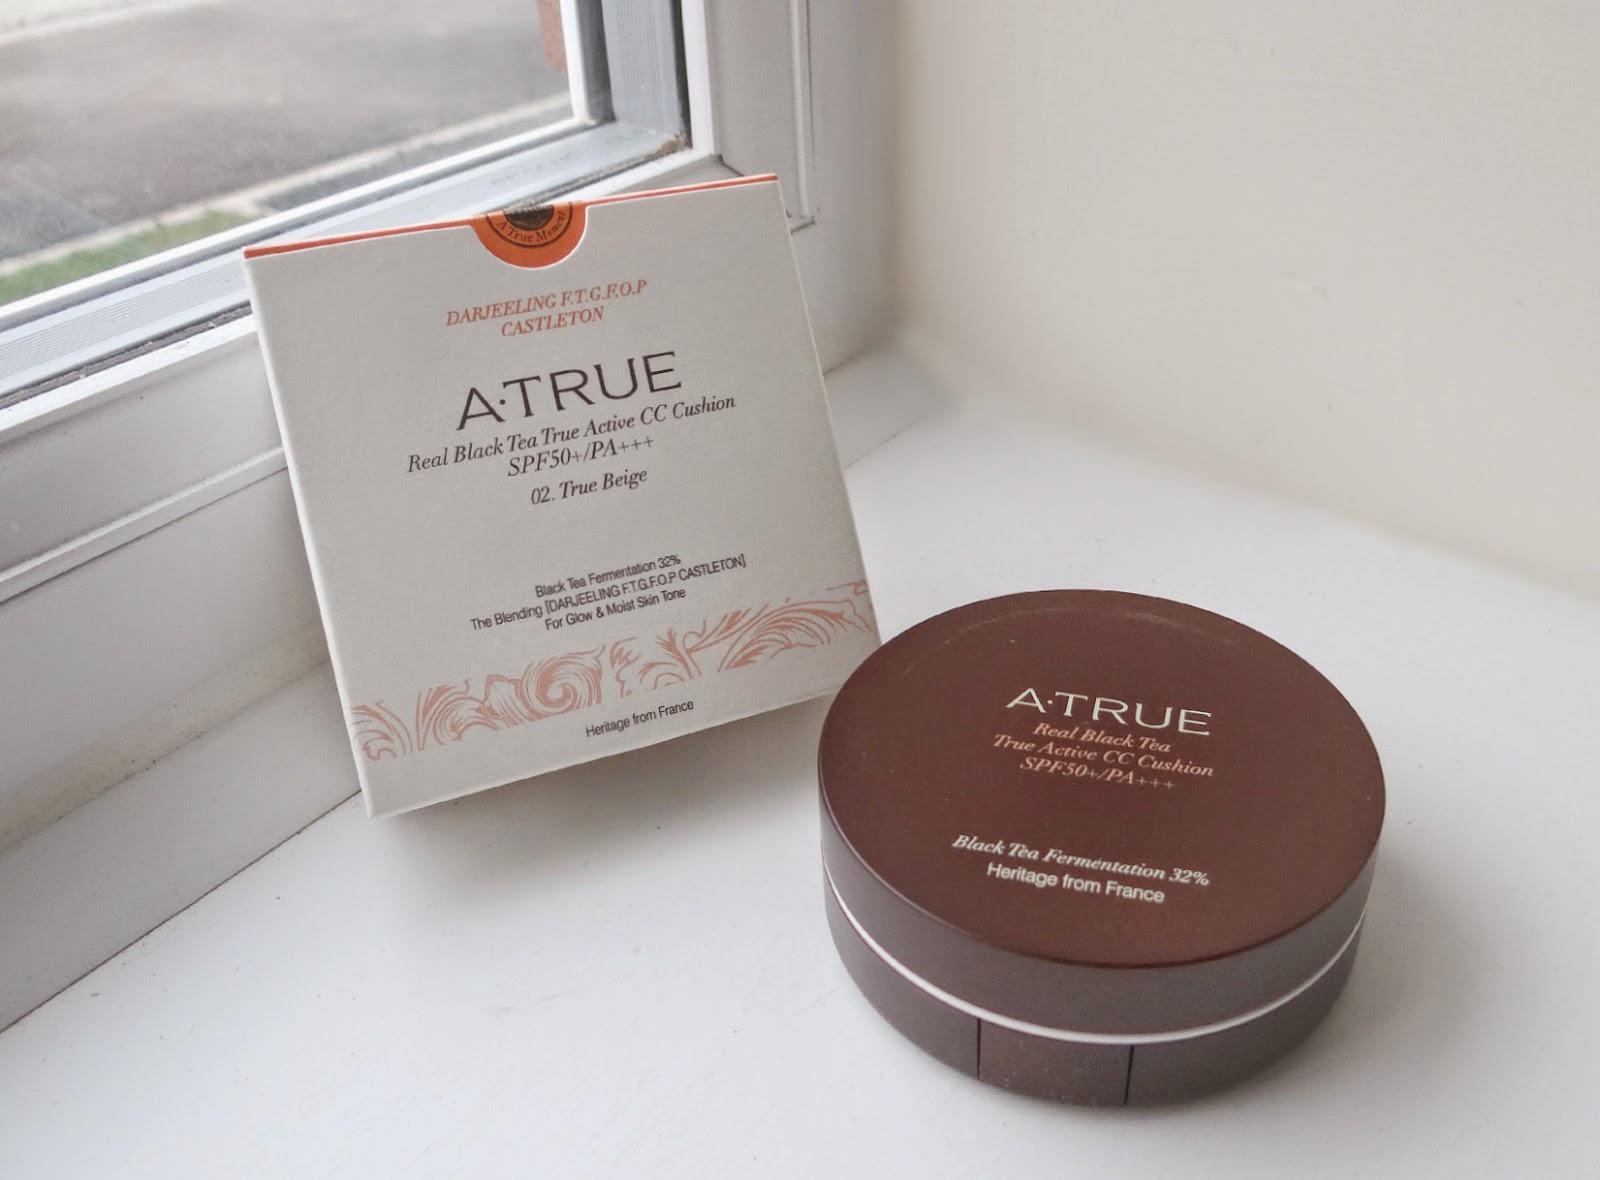 CC Cushion, A.True CC Cushion, tea beauty products